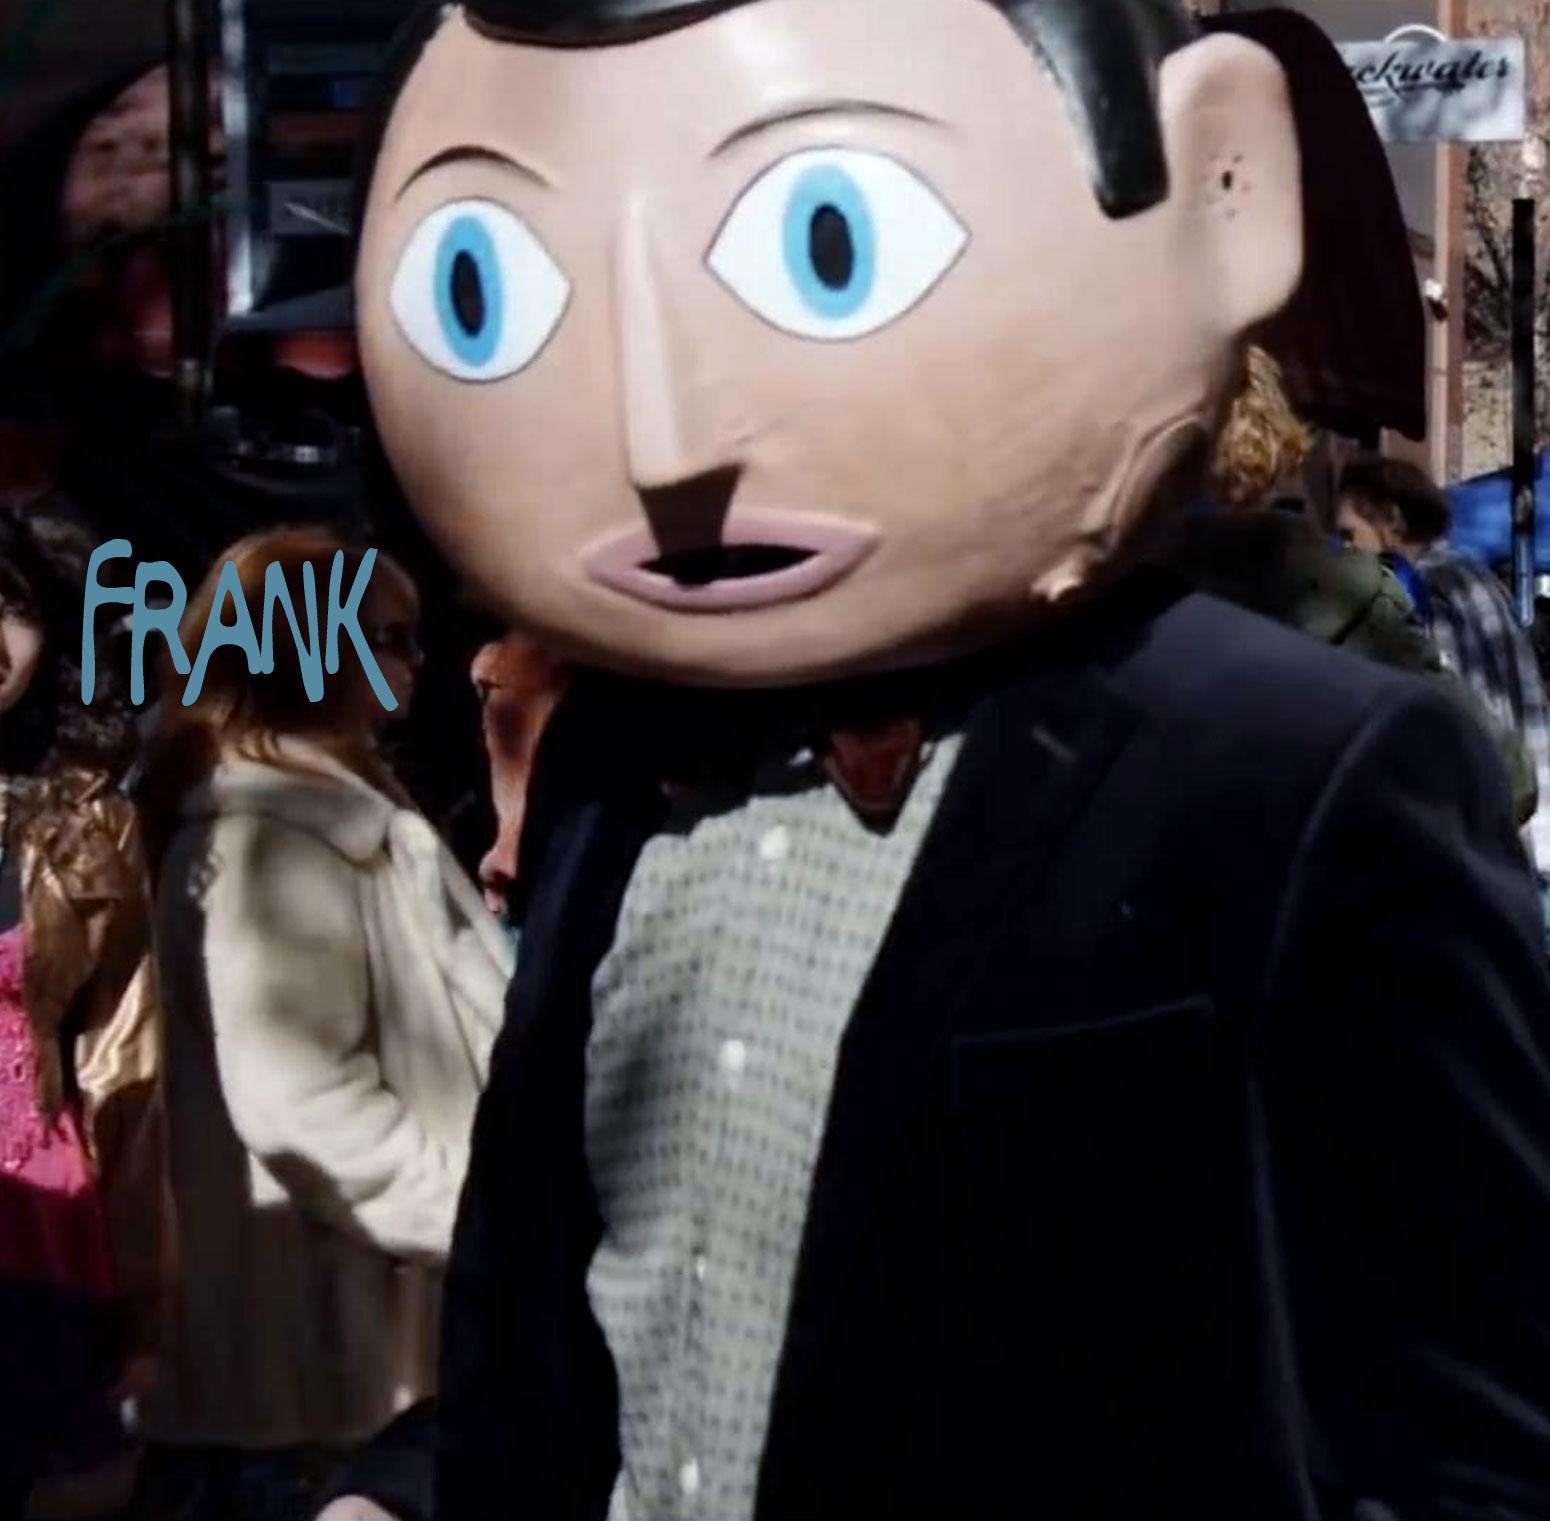 Michael Fassbender: Frank 2013 Michael Fassbender